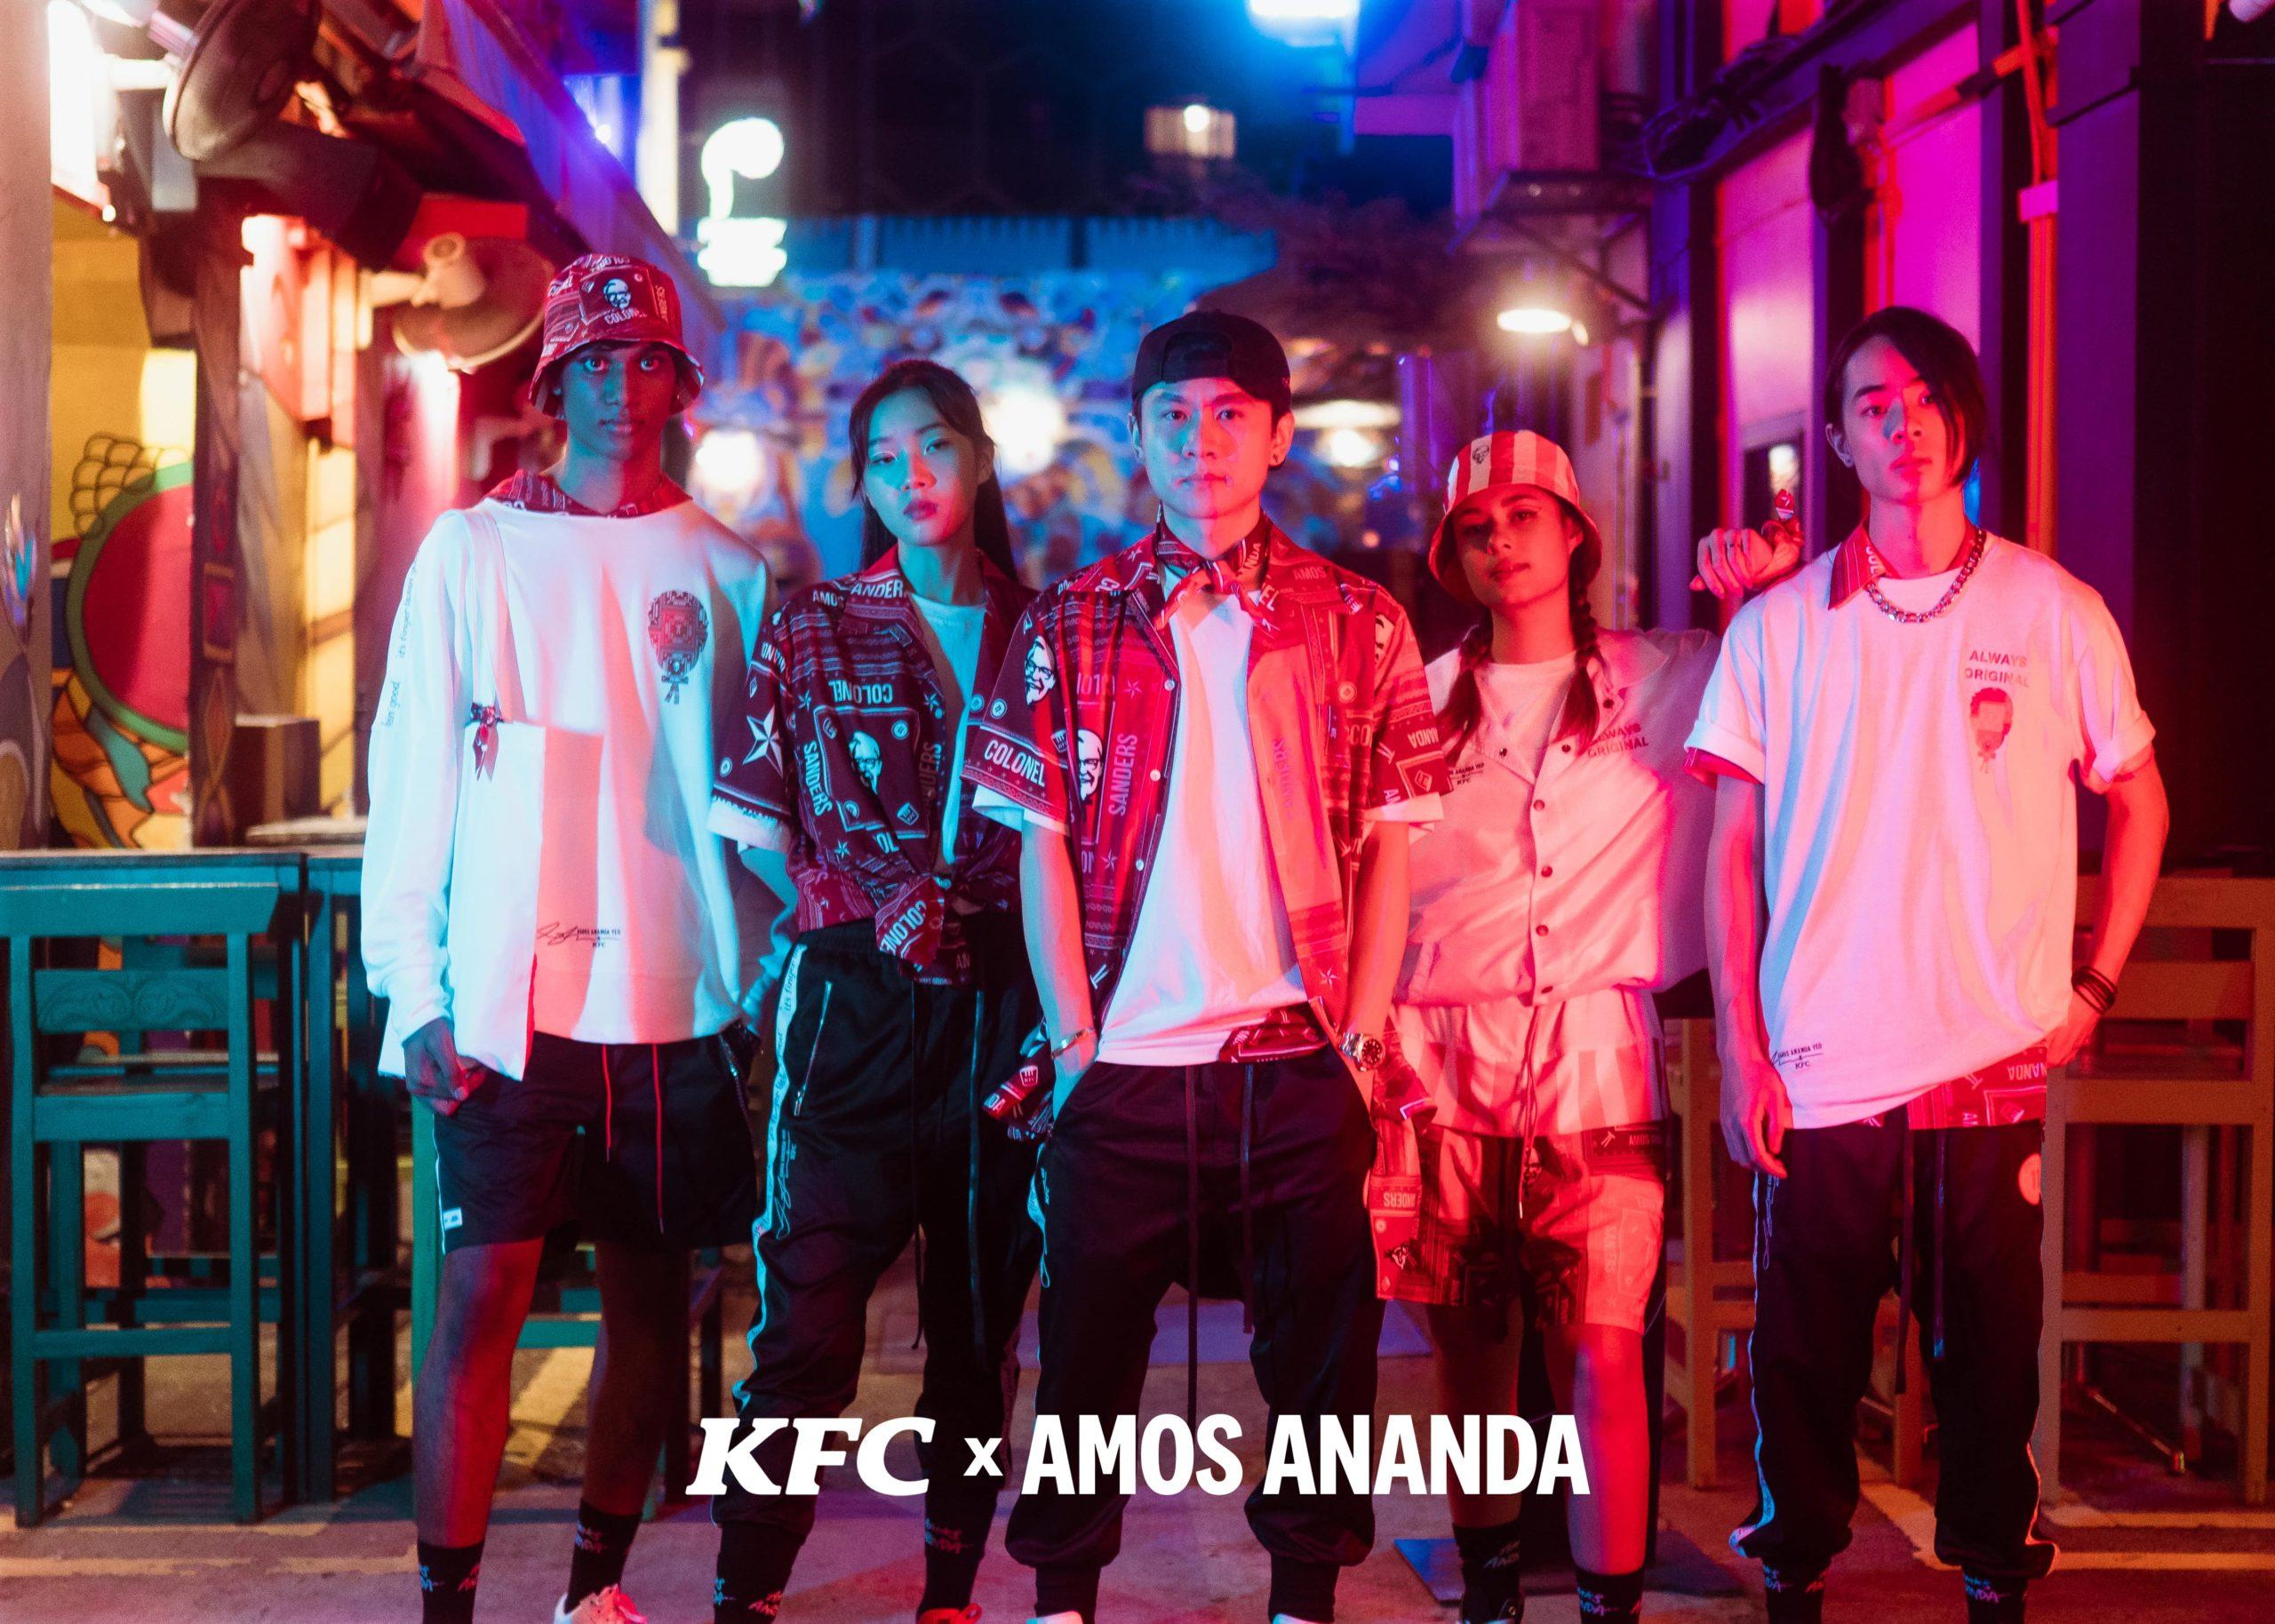 KFC Meets Streetwear: Amos Ananda Collaborates With KFC